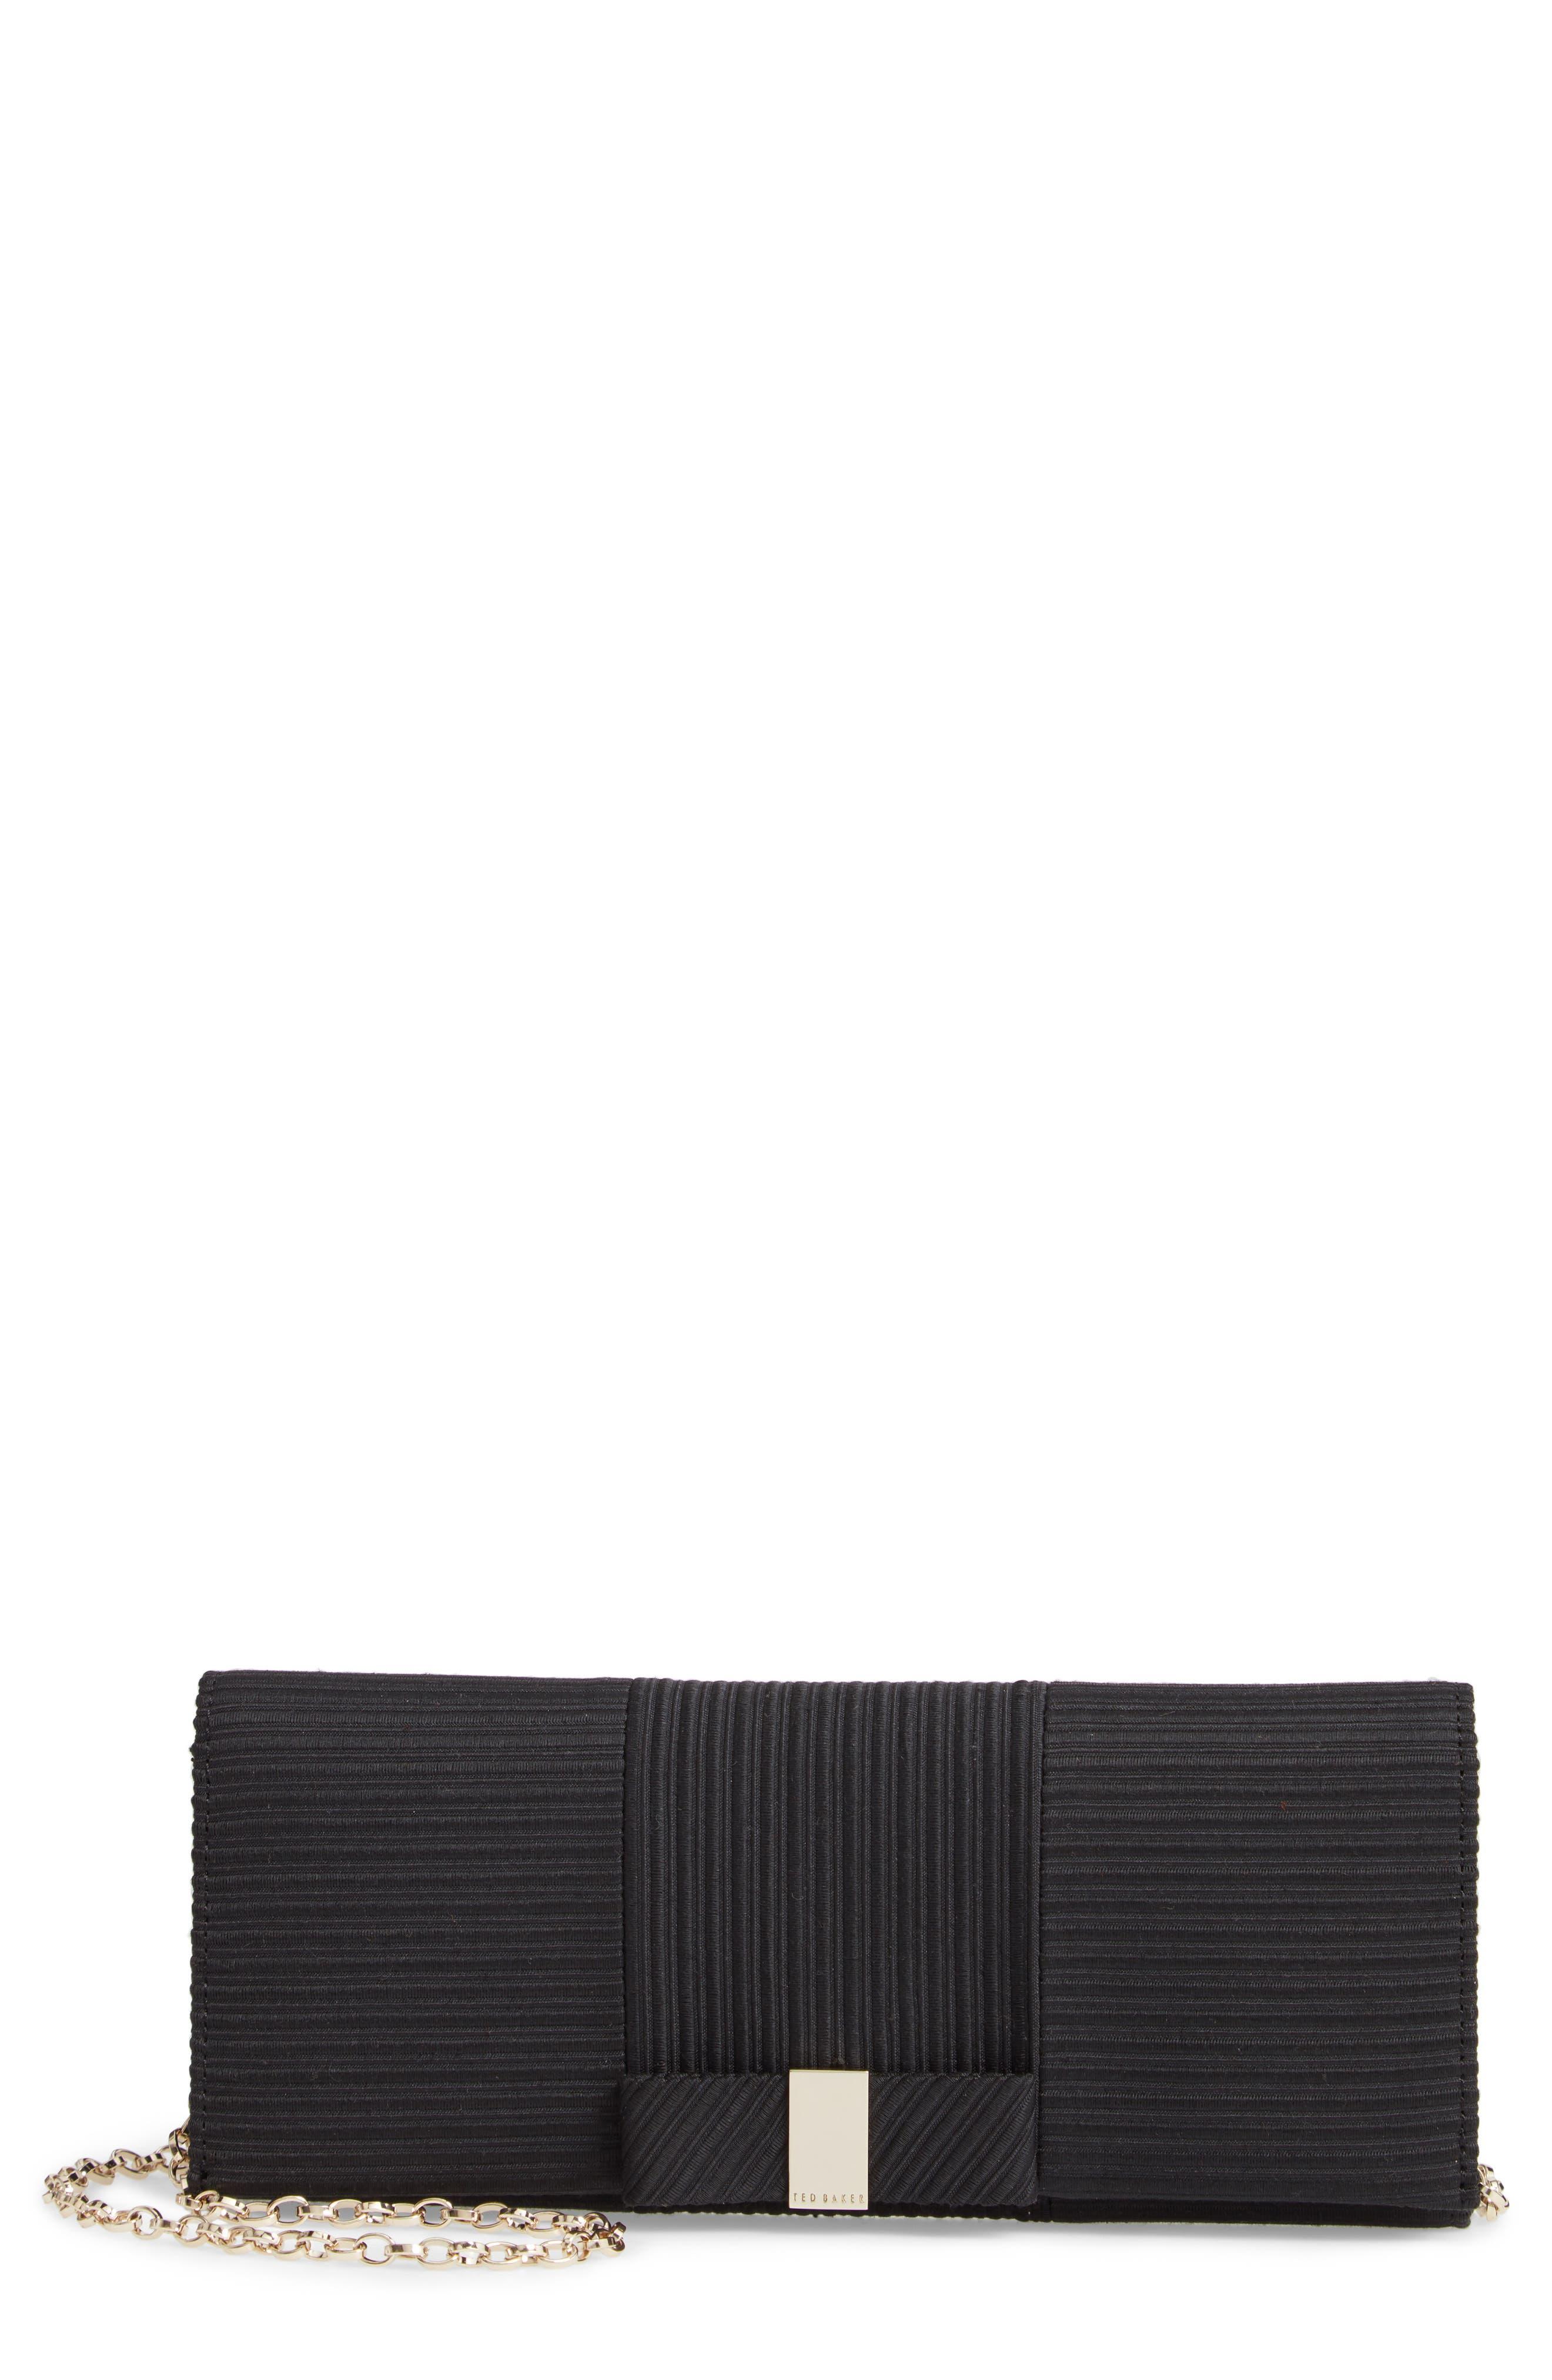 Emilee Bow Evening Bag,                         Main,                         color, BLACK